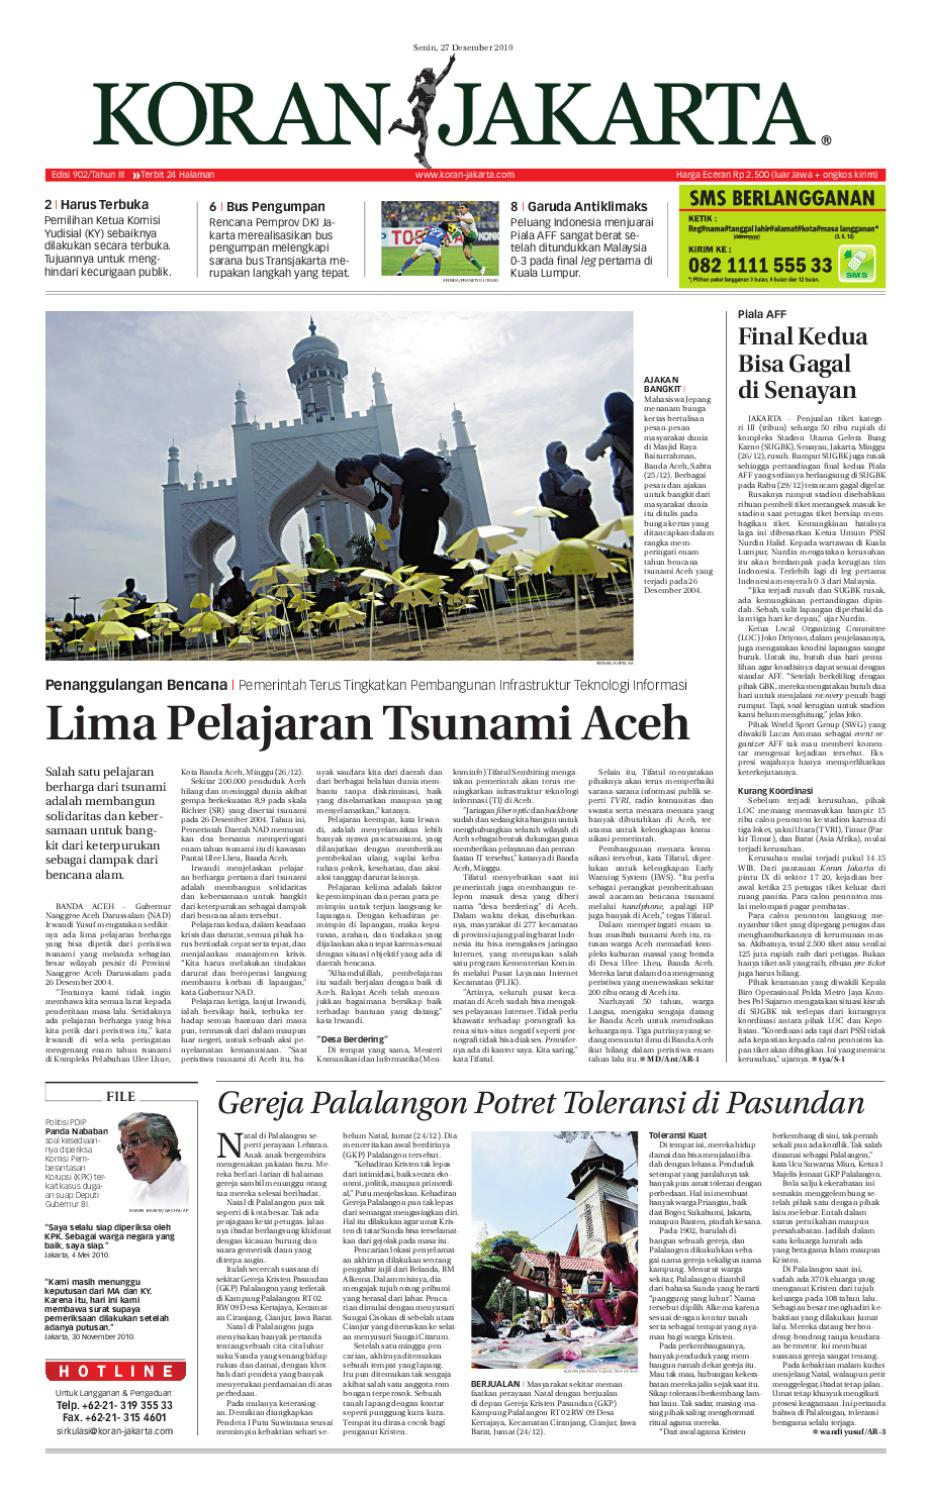 Edisi 1010 18 April 2011 By Pt Berita Nusantara Issuu Krezi Kamis 26 Carteramp039s 3 Pieces Pakaian Bayi Boy Tersedia Banyak Motif 902 27 Desember 2010